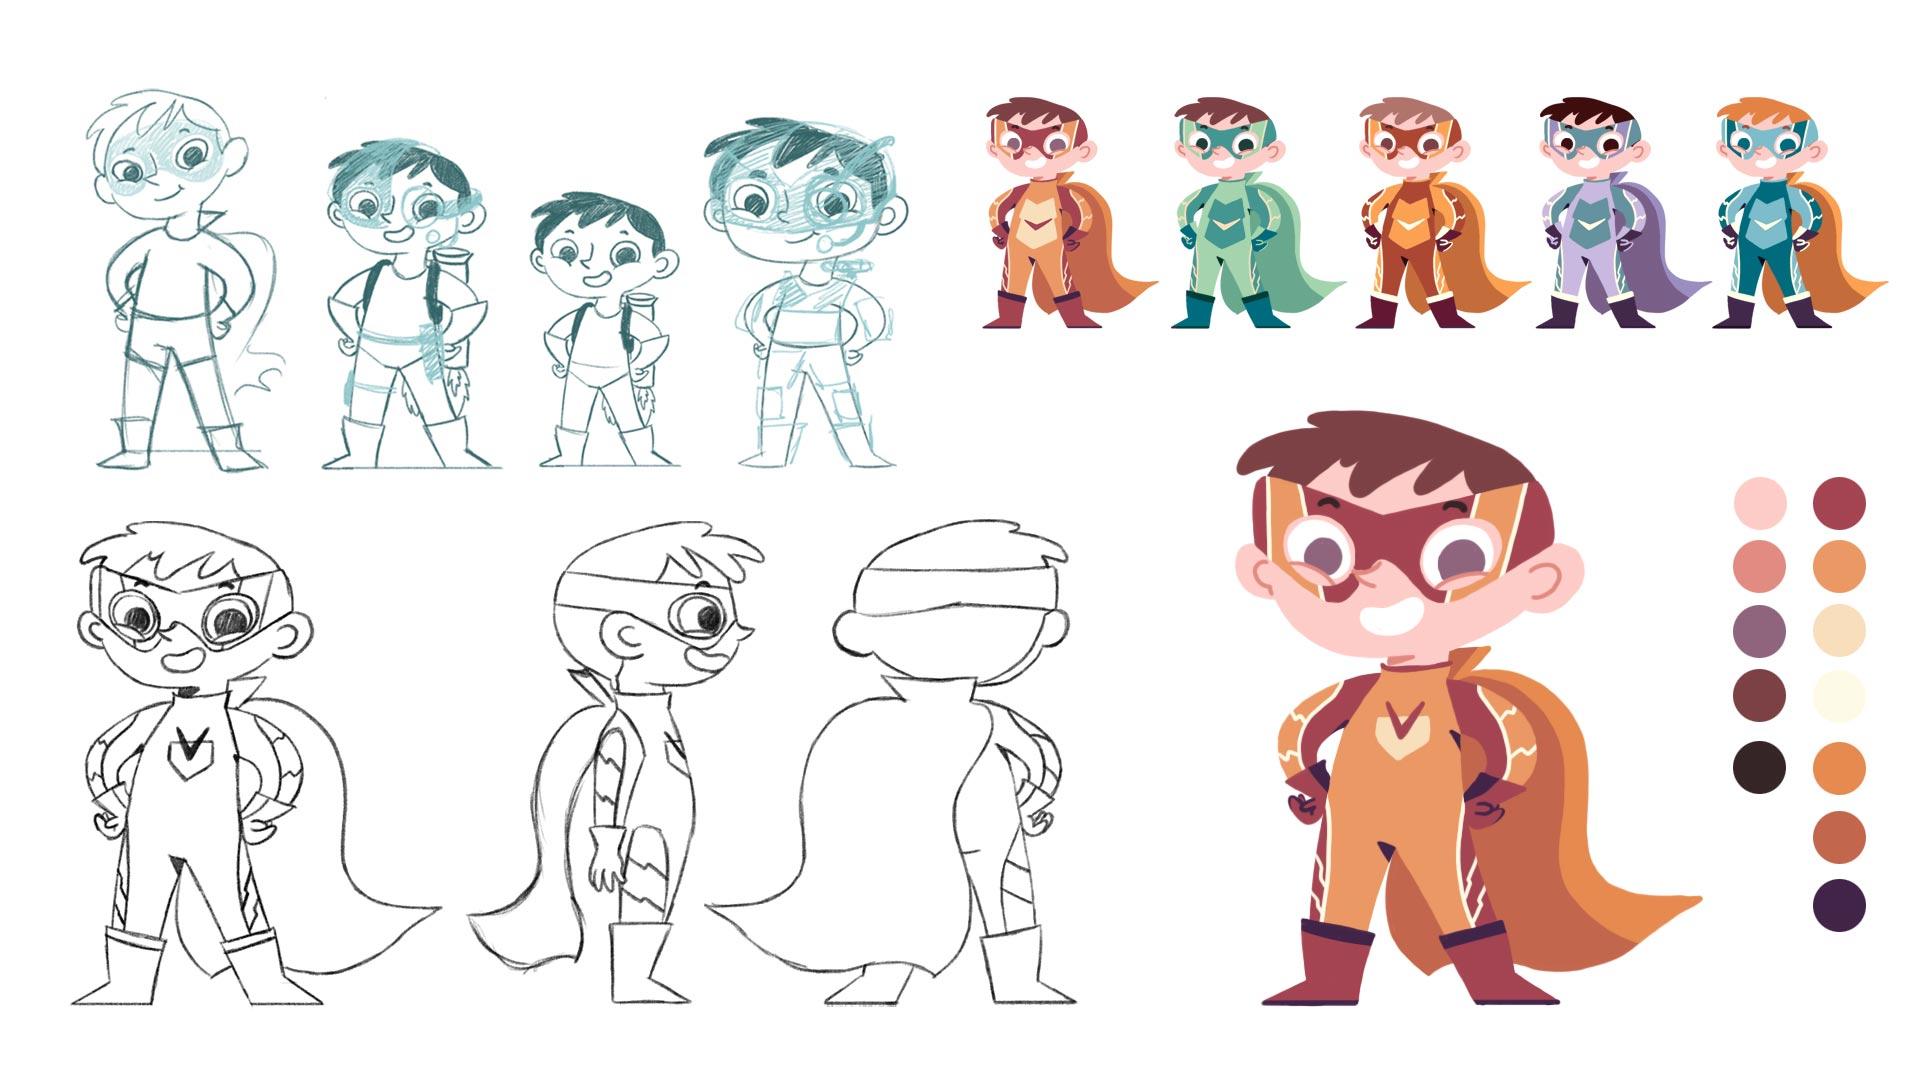 LordMeningococco_animation_character_racoonstudio_motion_educom_3